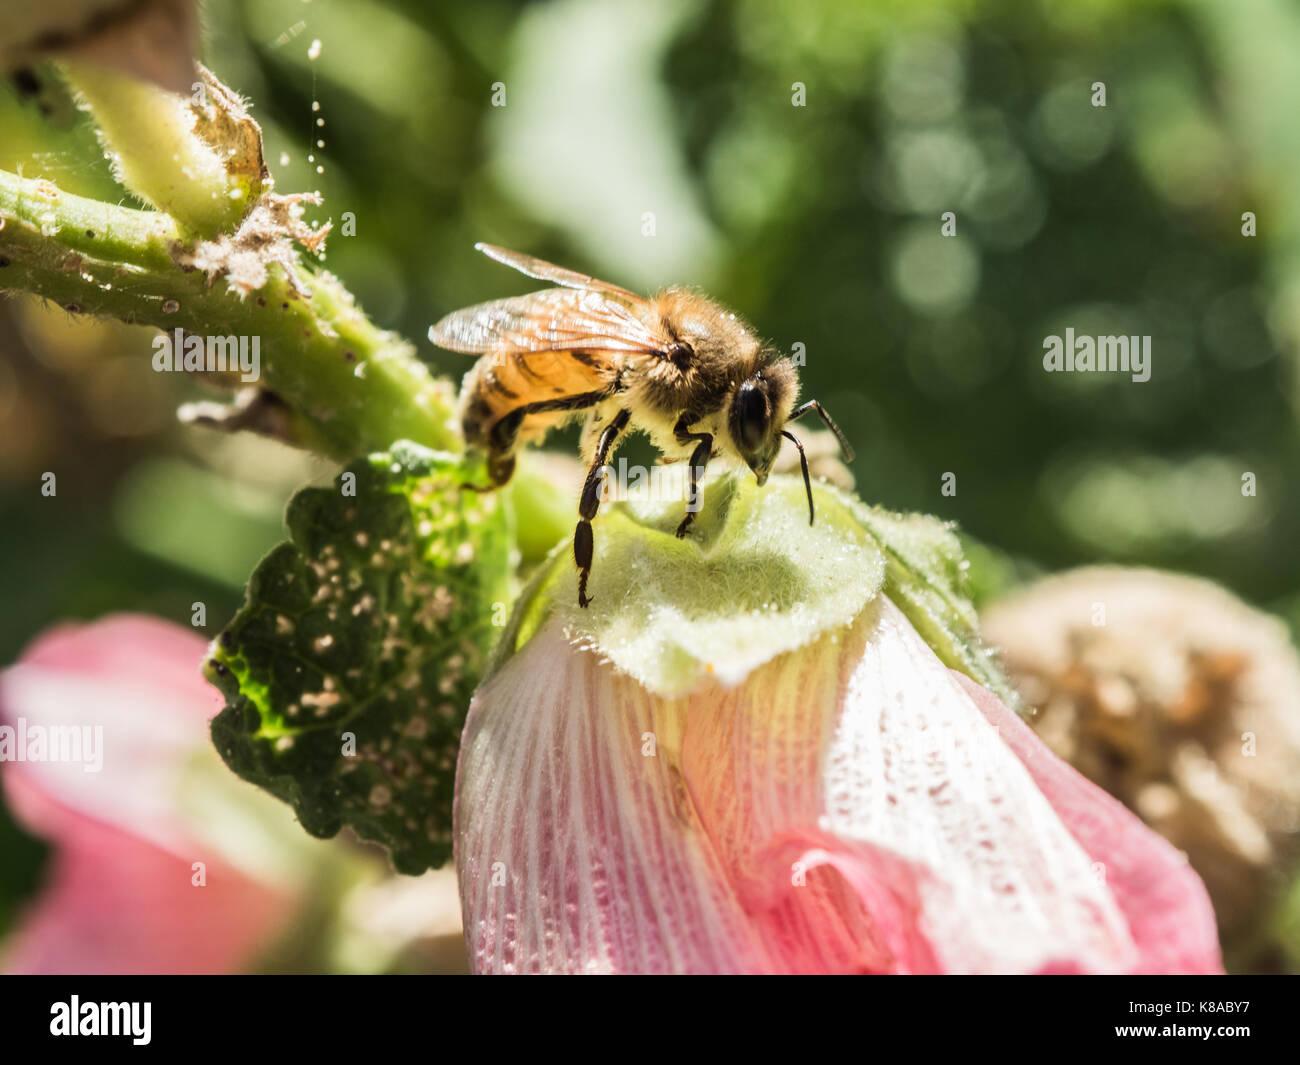 Polinizando. bonito panorama de la abeja de miel de abeja occidental polinizan flores rosadas. macro vista. Cerca. Imagen De Stock